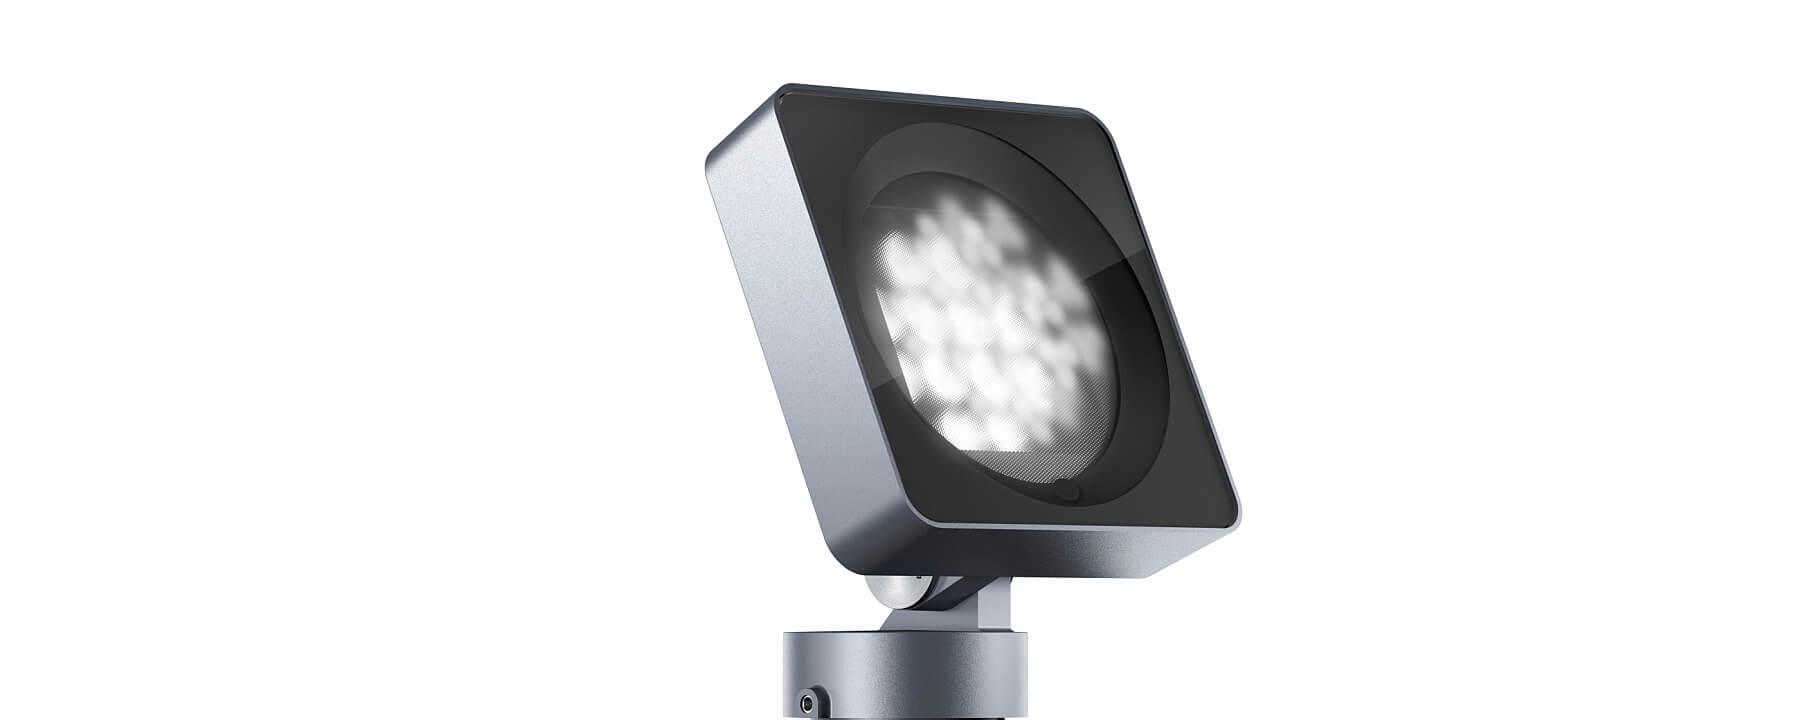 ERCO lighting product lightscan